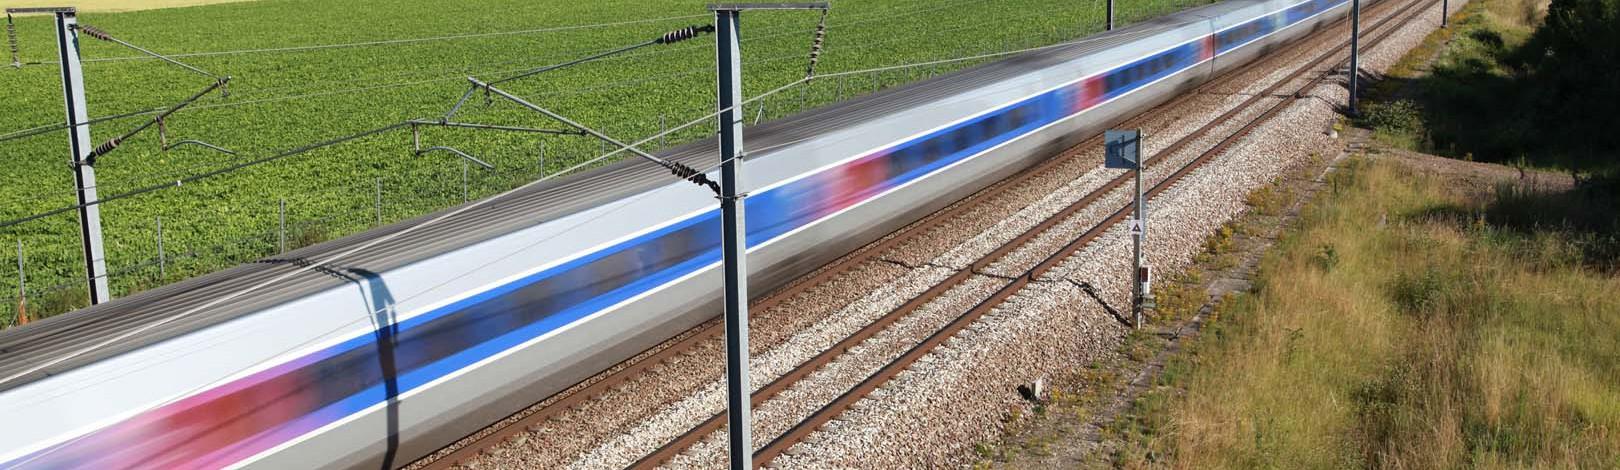 Transport ferrovière TGV